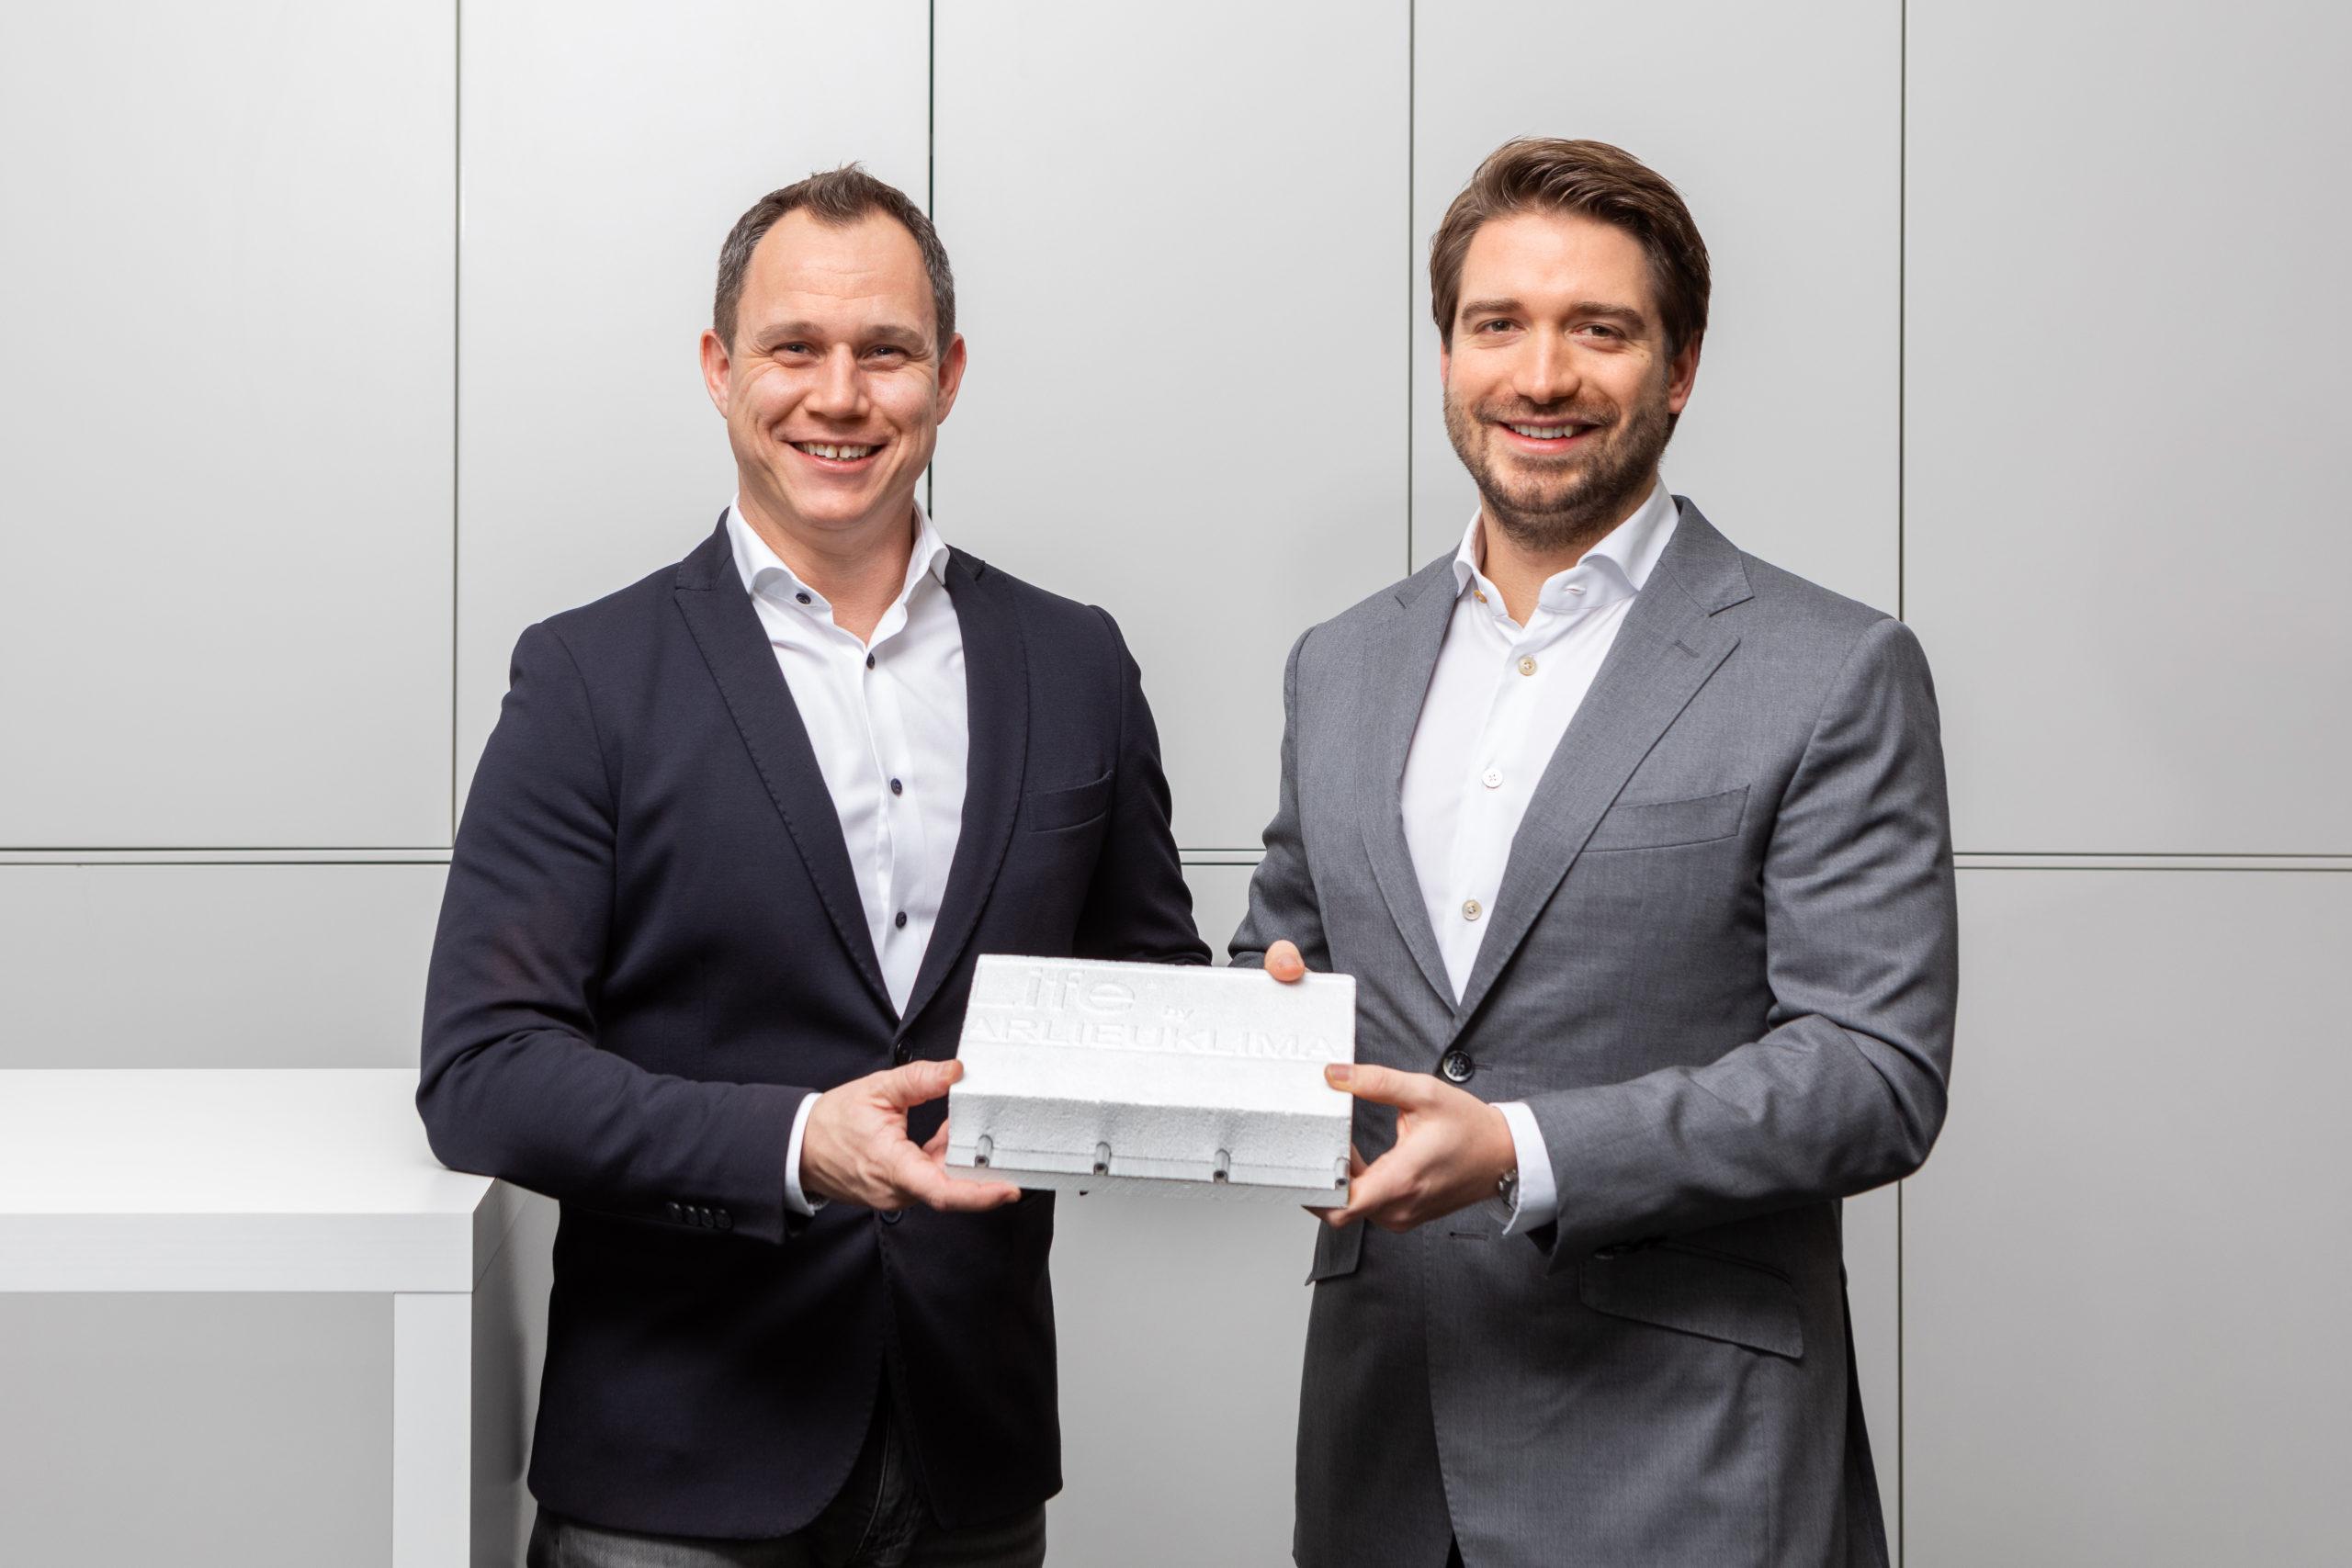 Geschäftsleitung liVENTO Jürgen Merkle und Geschäftsleitung KE KELIT Karl Egger